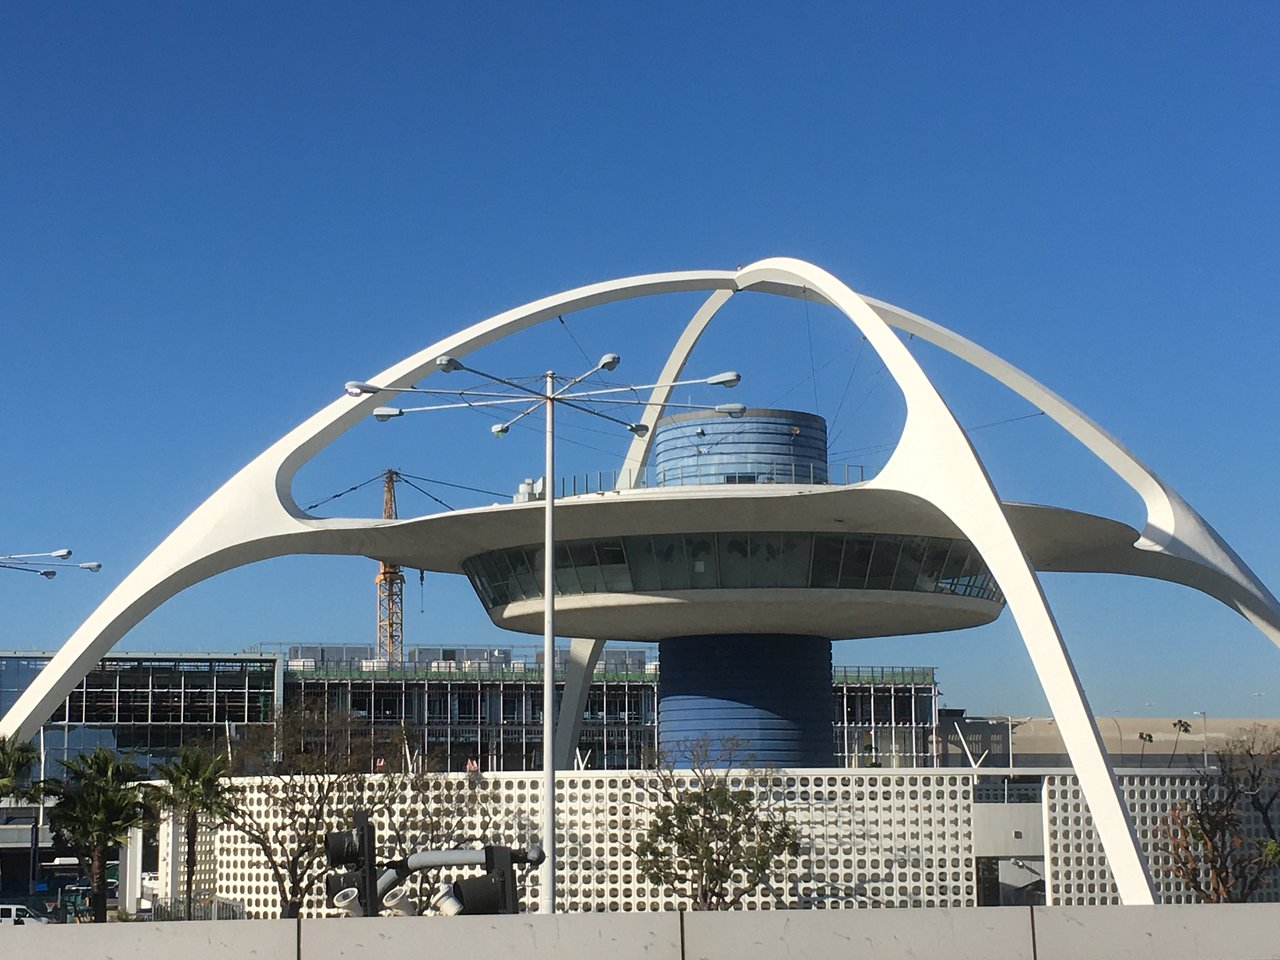 lax-theme-building